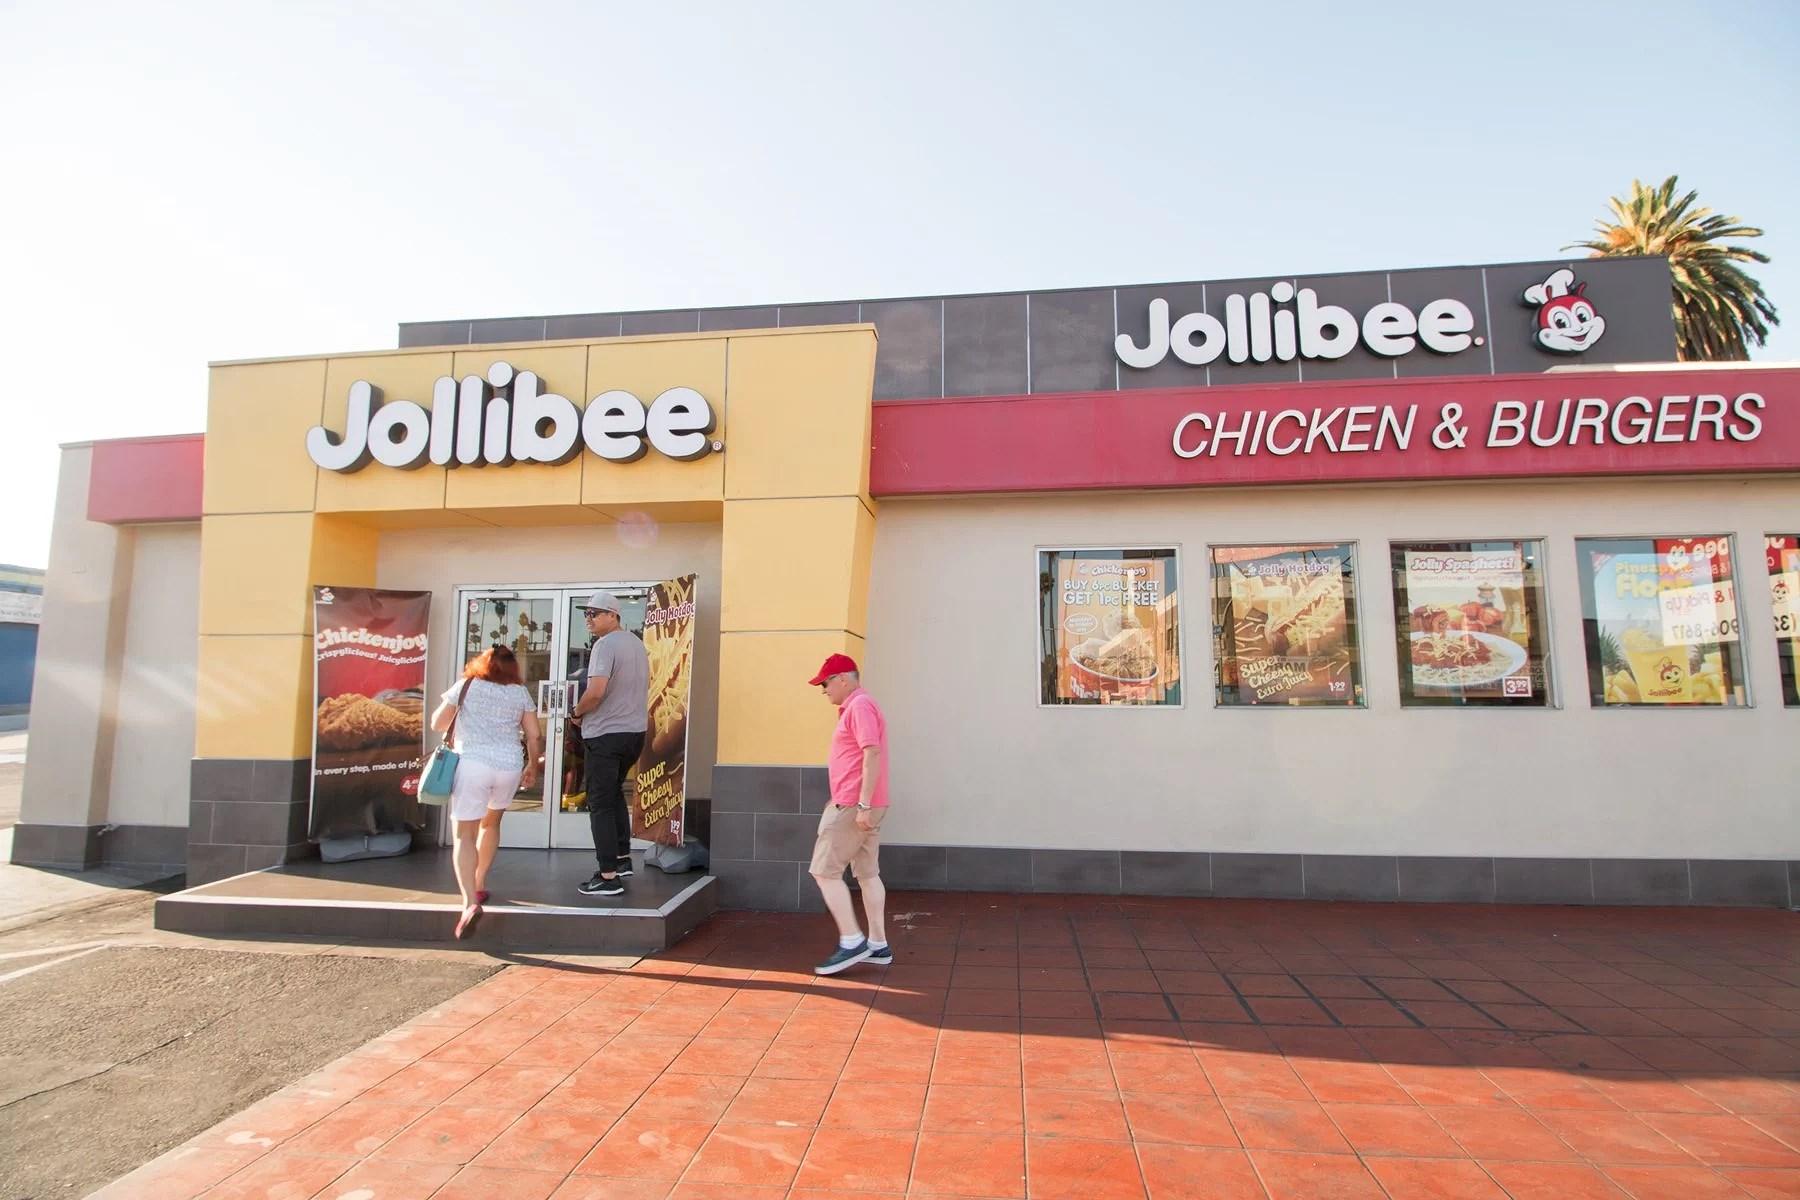 Los Angeles - Welcome to Jollibee!